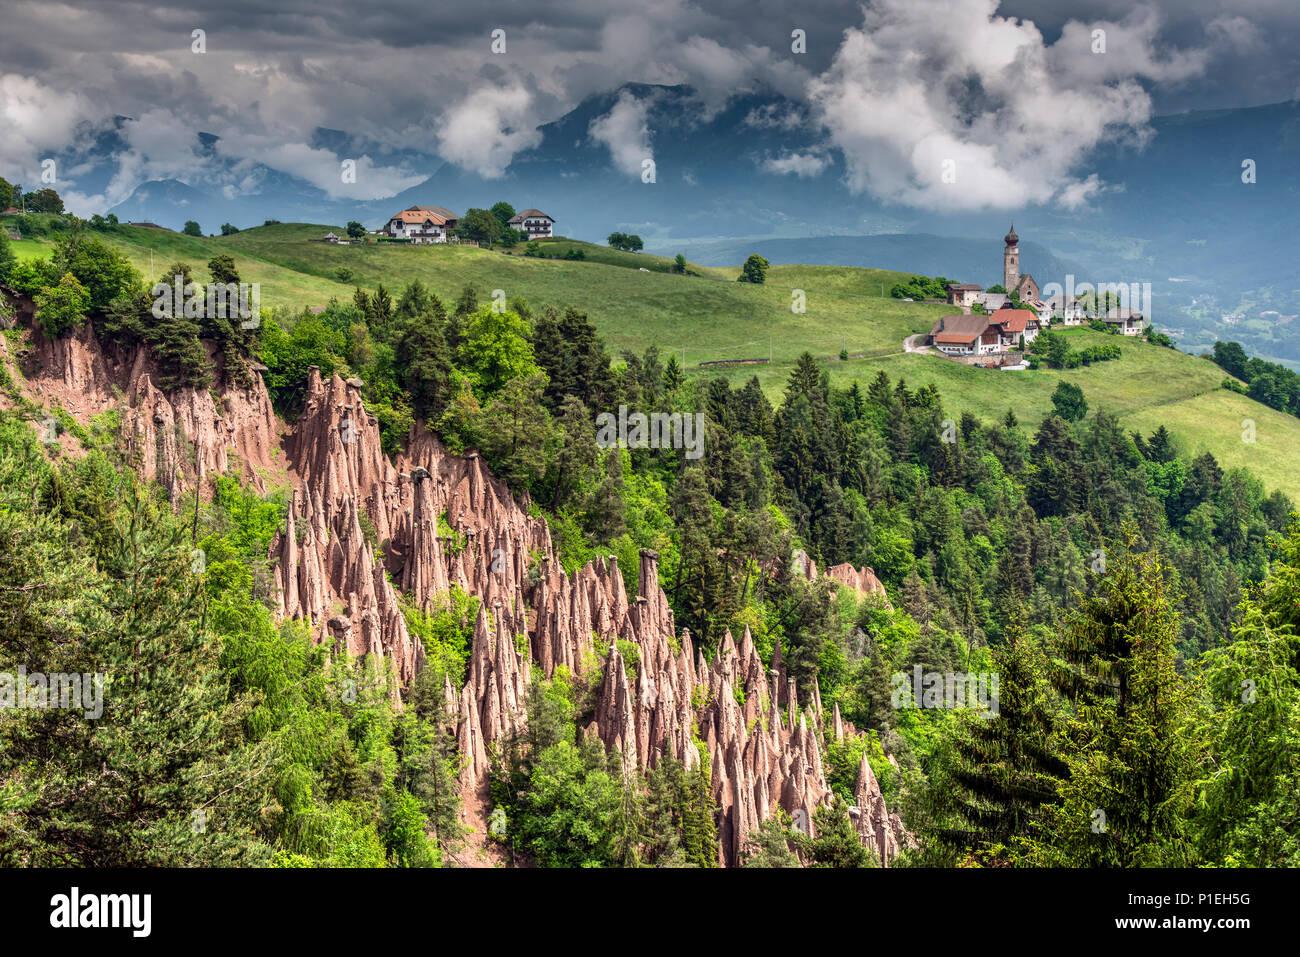 Pyramides de la terre, Renon - Ritten, Trentin-Haut-Adige - Tyrol du Sud, Italie Photo Stock